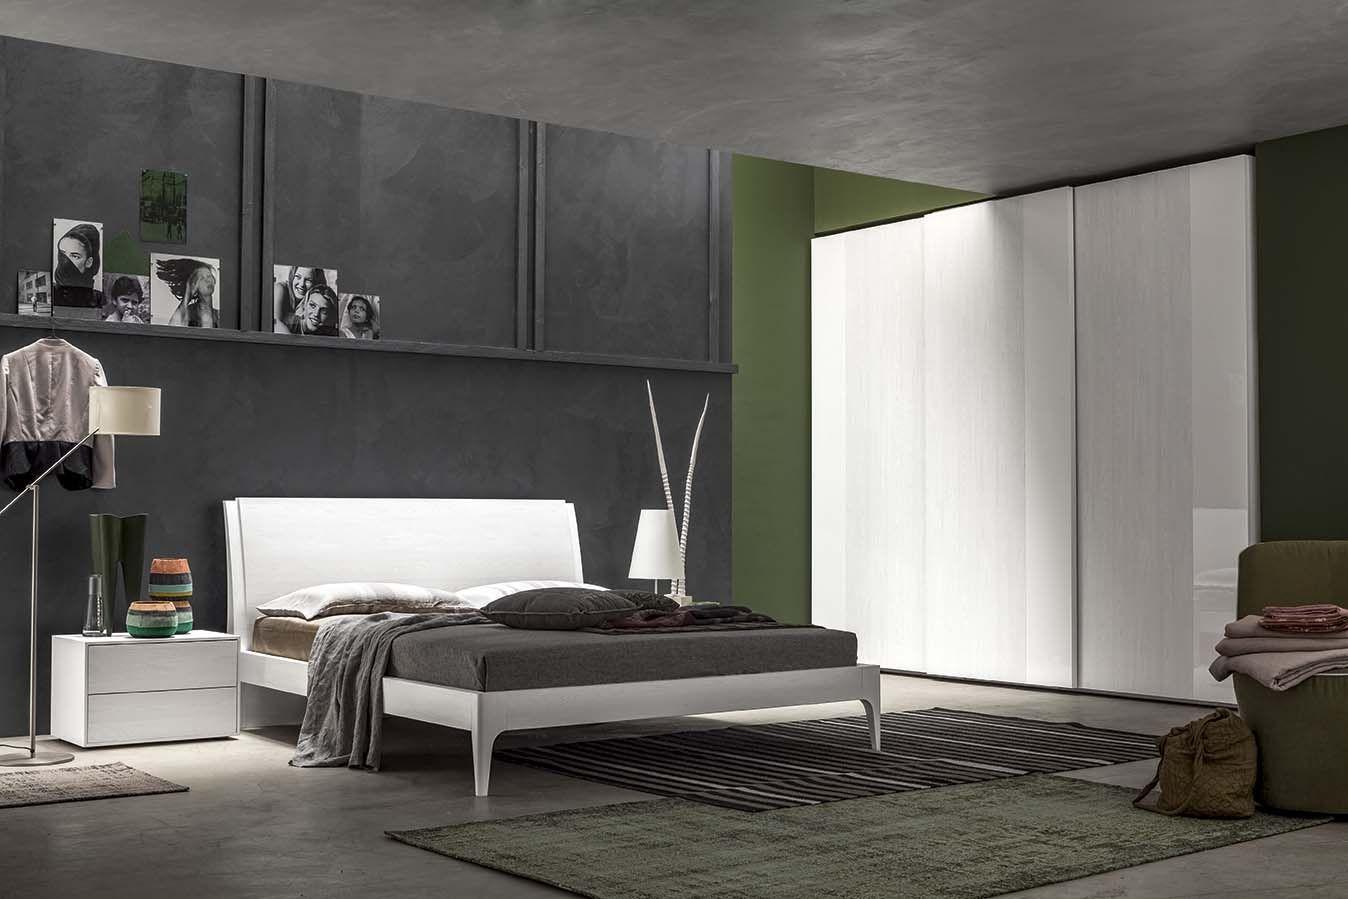 komfort mond designer betten zanette 2, santa lucia tod #bed #bedroom #bedset #bedroomfurniture | bedroom, Design ideen